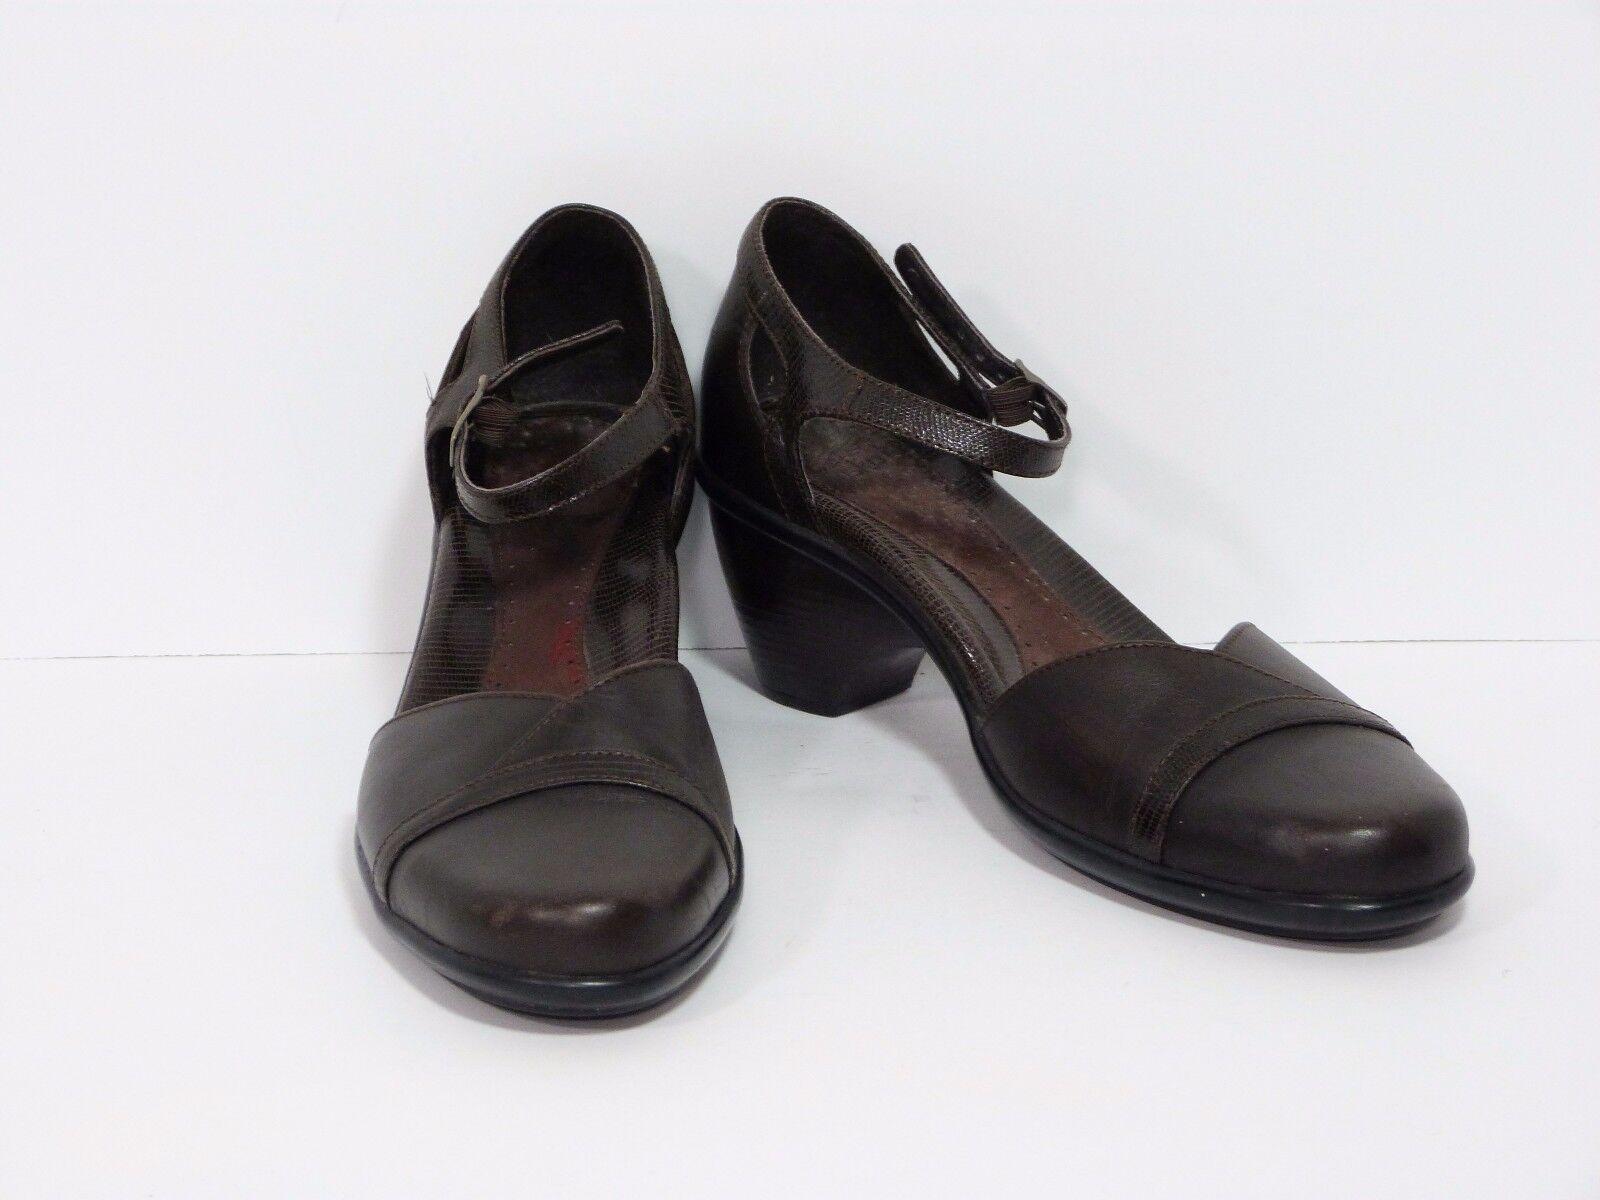 DANSKO Womens Roxy Brown Leather Heel Pump Ankle Strap Mary Jane Size 41 10.5-11